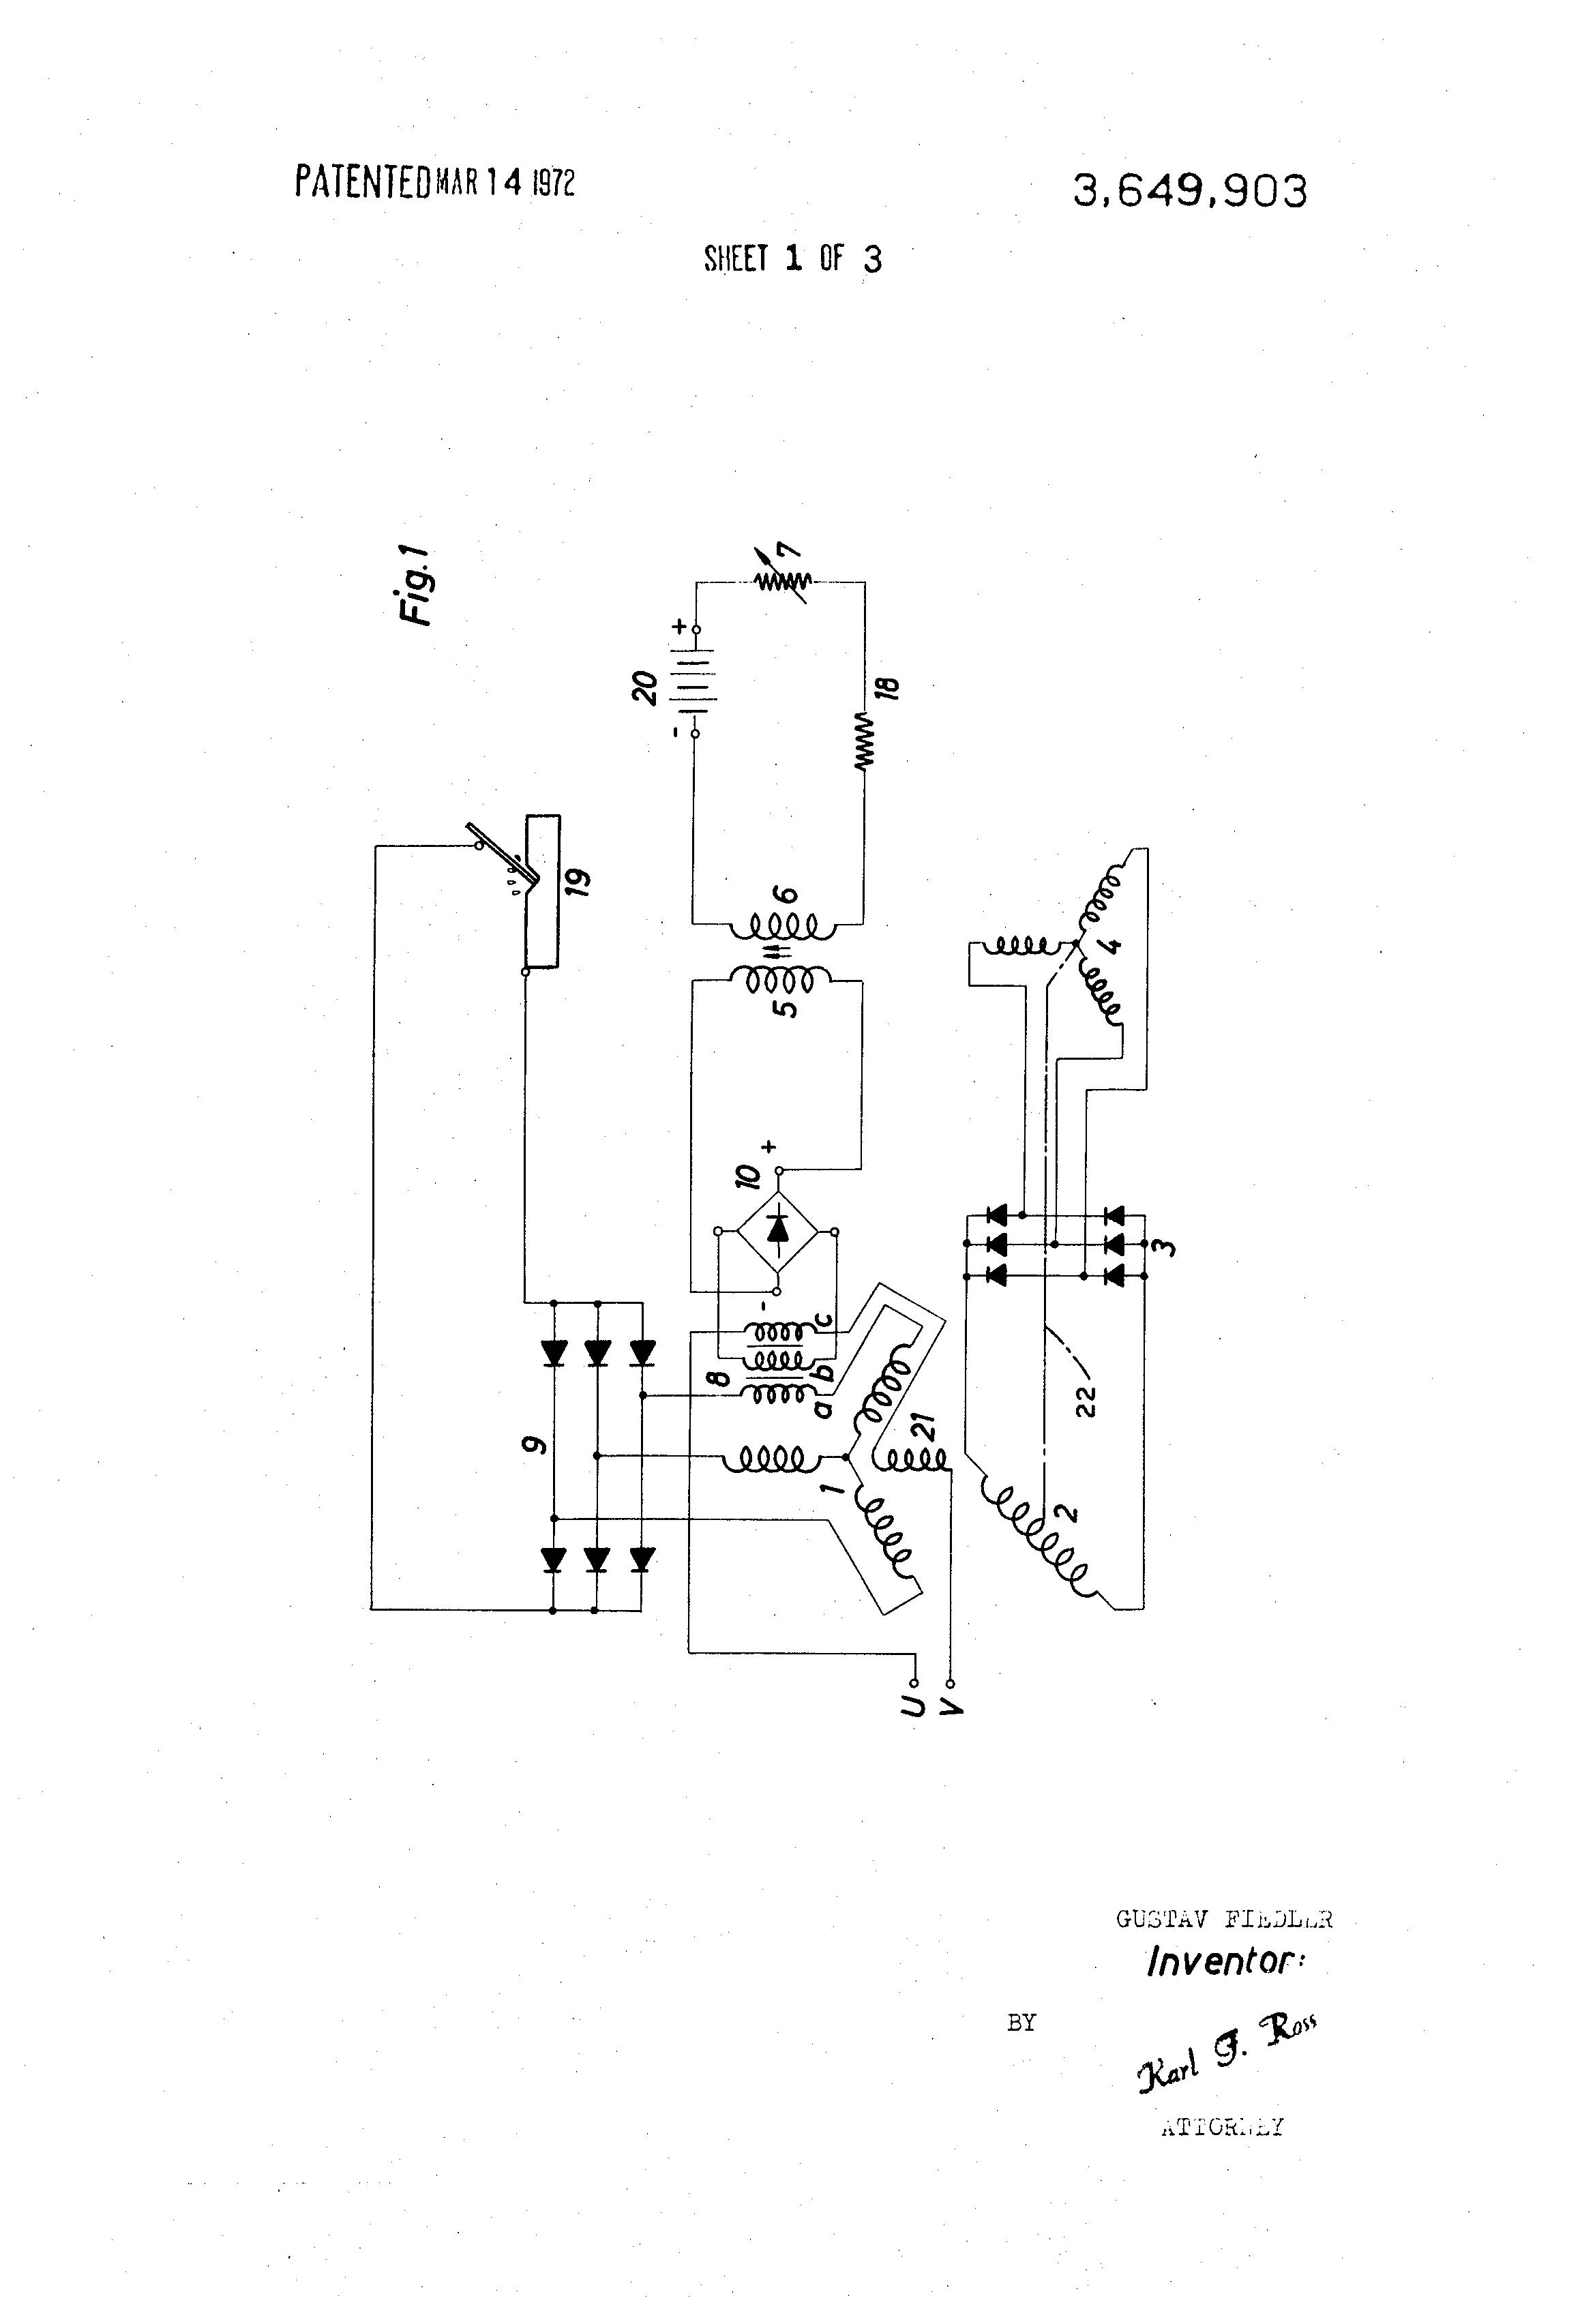 Welding Generator Diagram - Wiring Diagrams List on